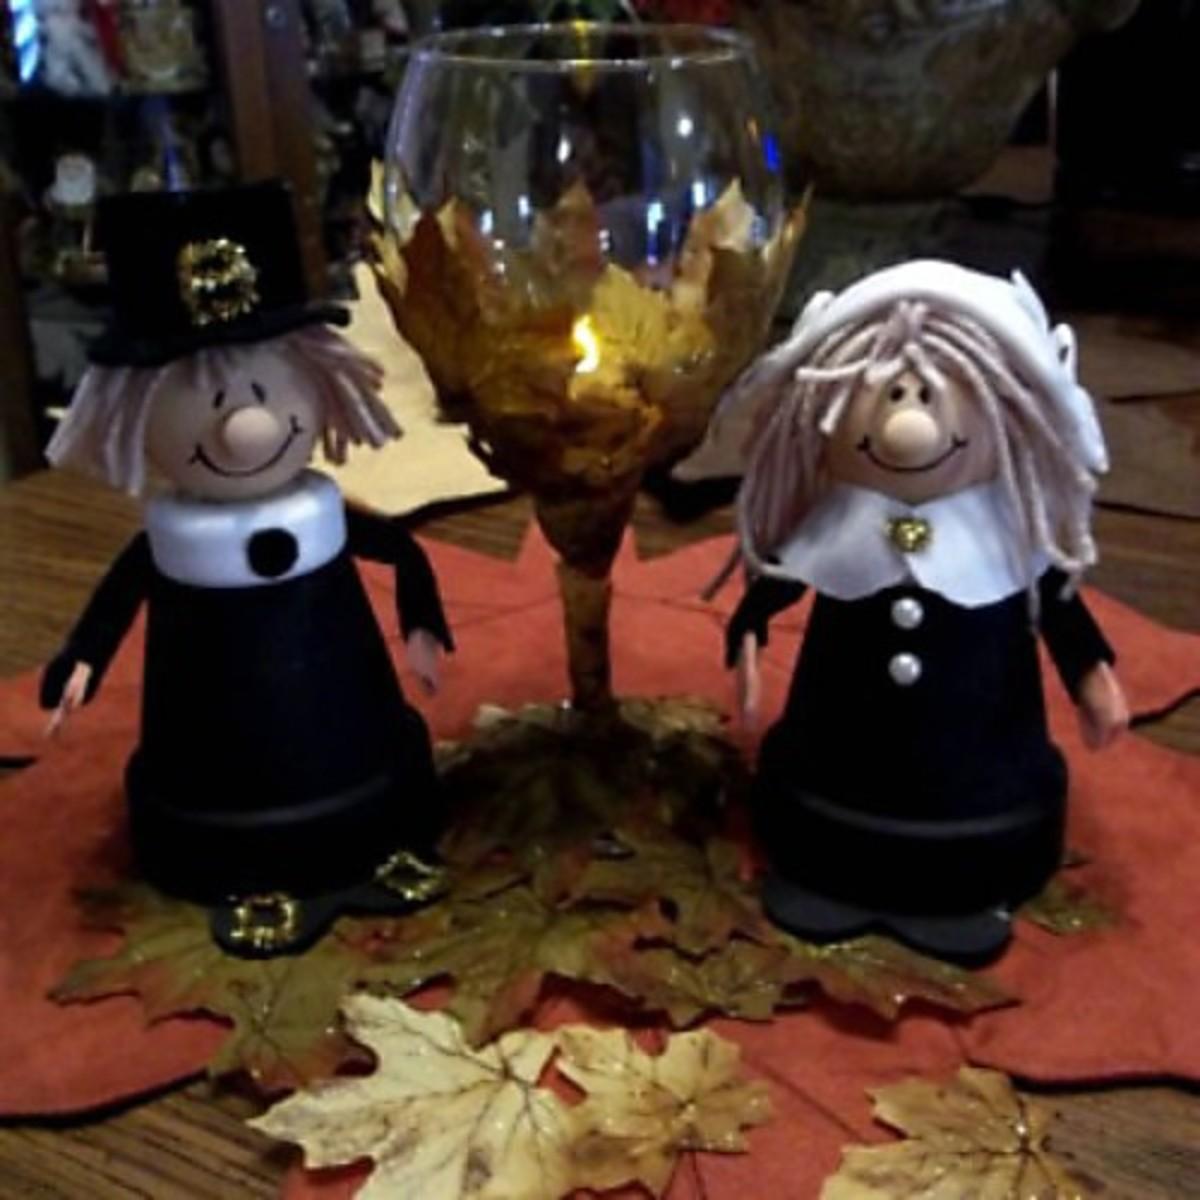 pilgrim-couple-centerpiece